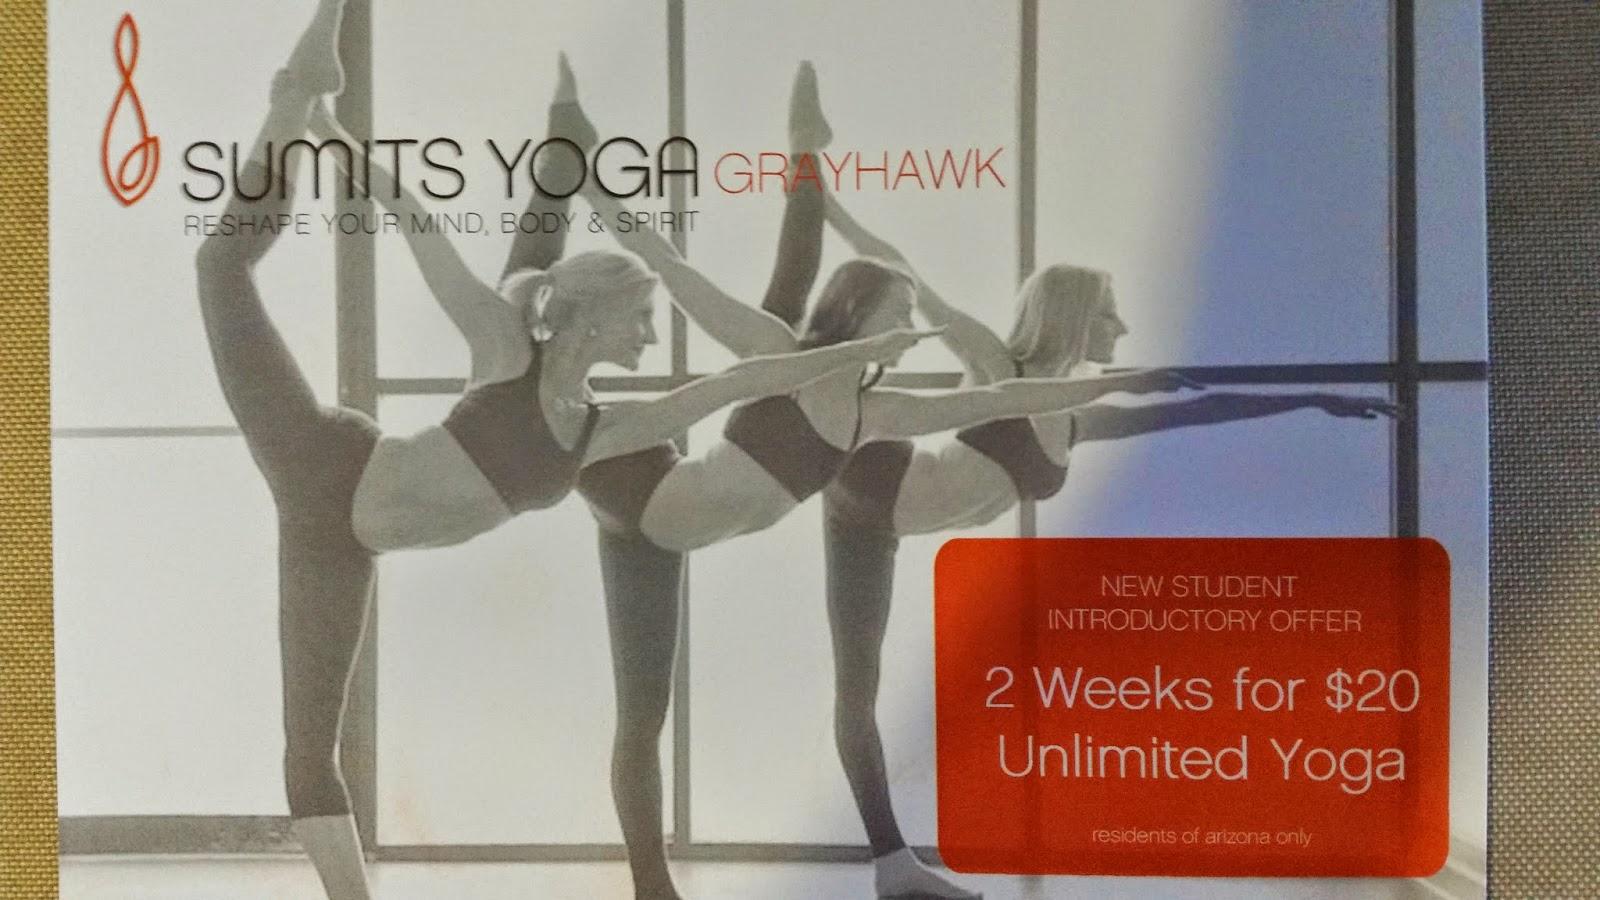 Sumits Yoga 85255: SUMITS HOT YOGA SCOTTSDALE, AZ 85255